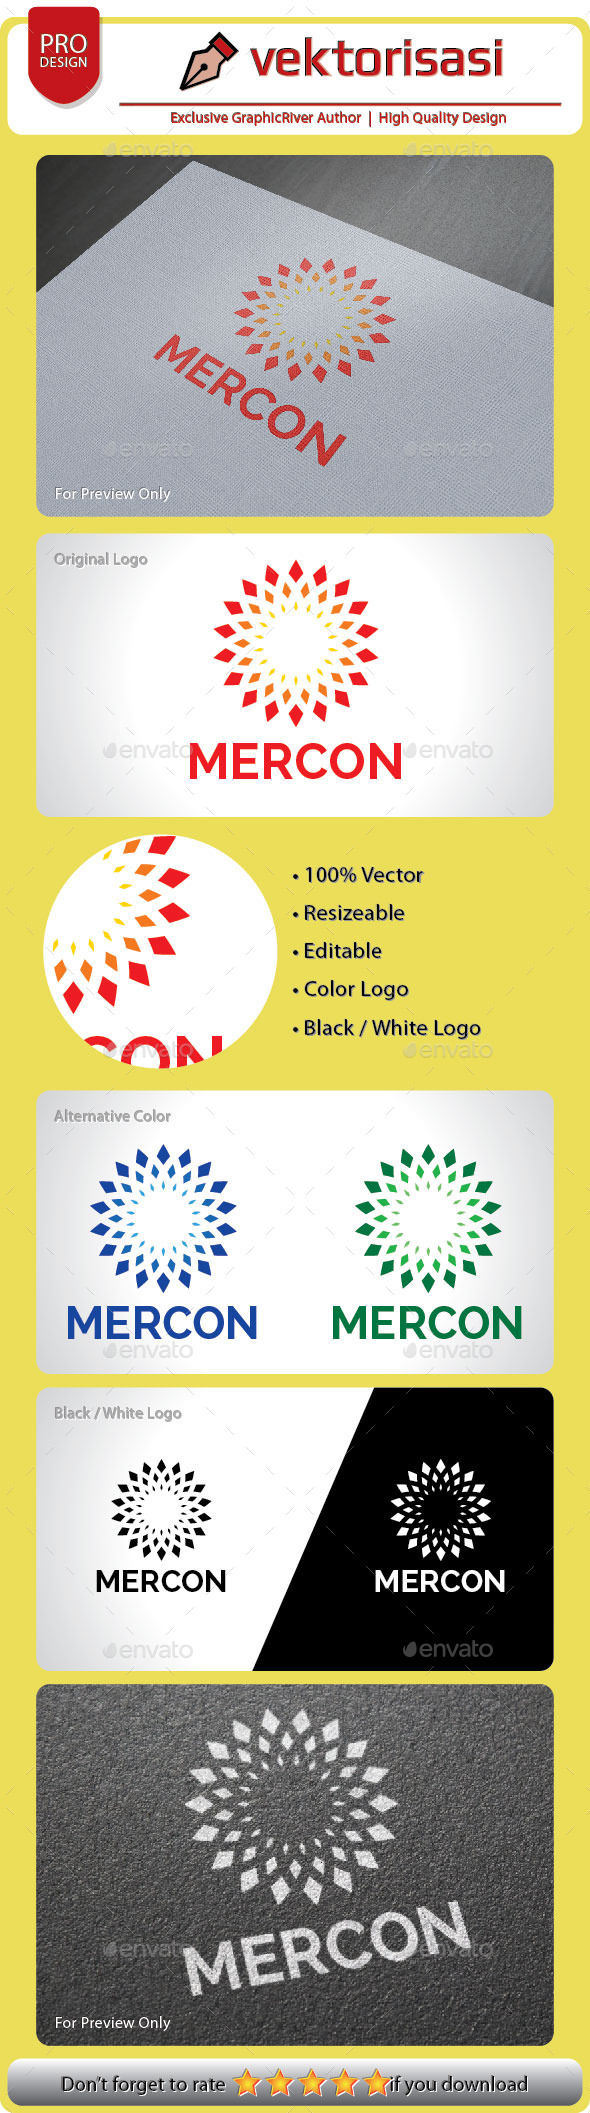 Mercon Logo